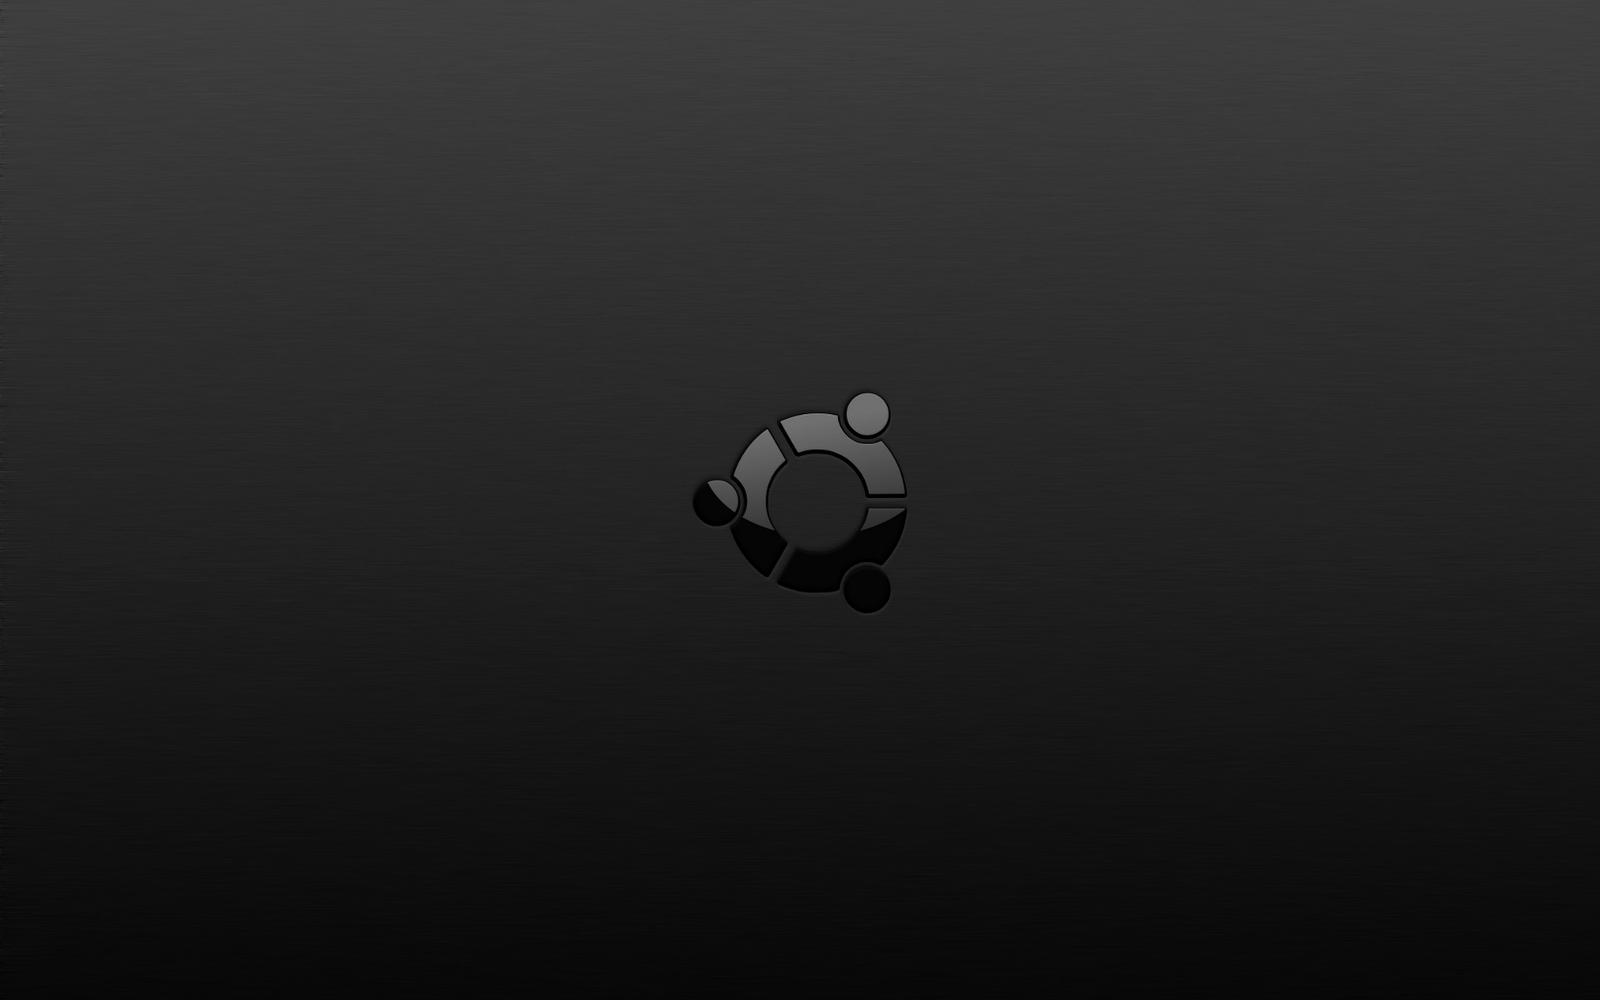 ubuntu background Page 5 1600x1000